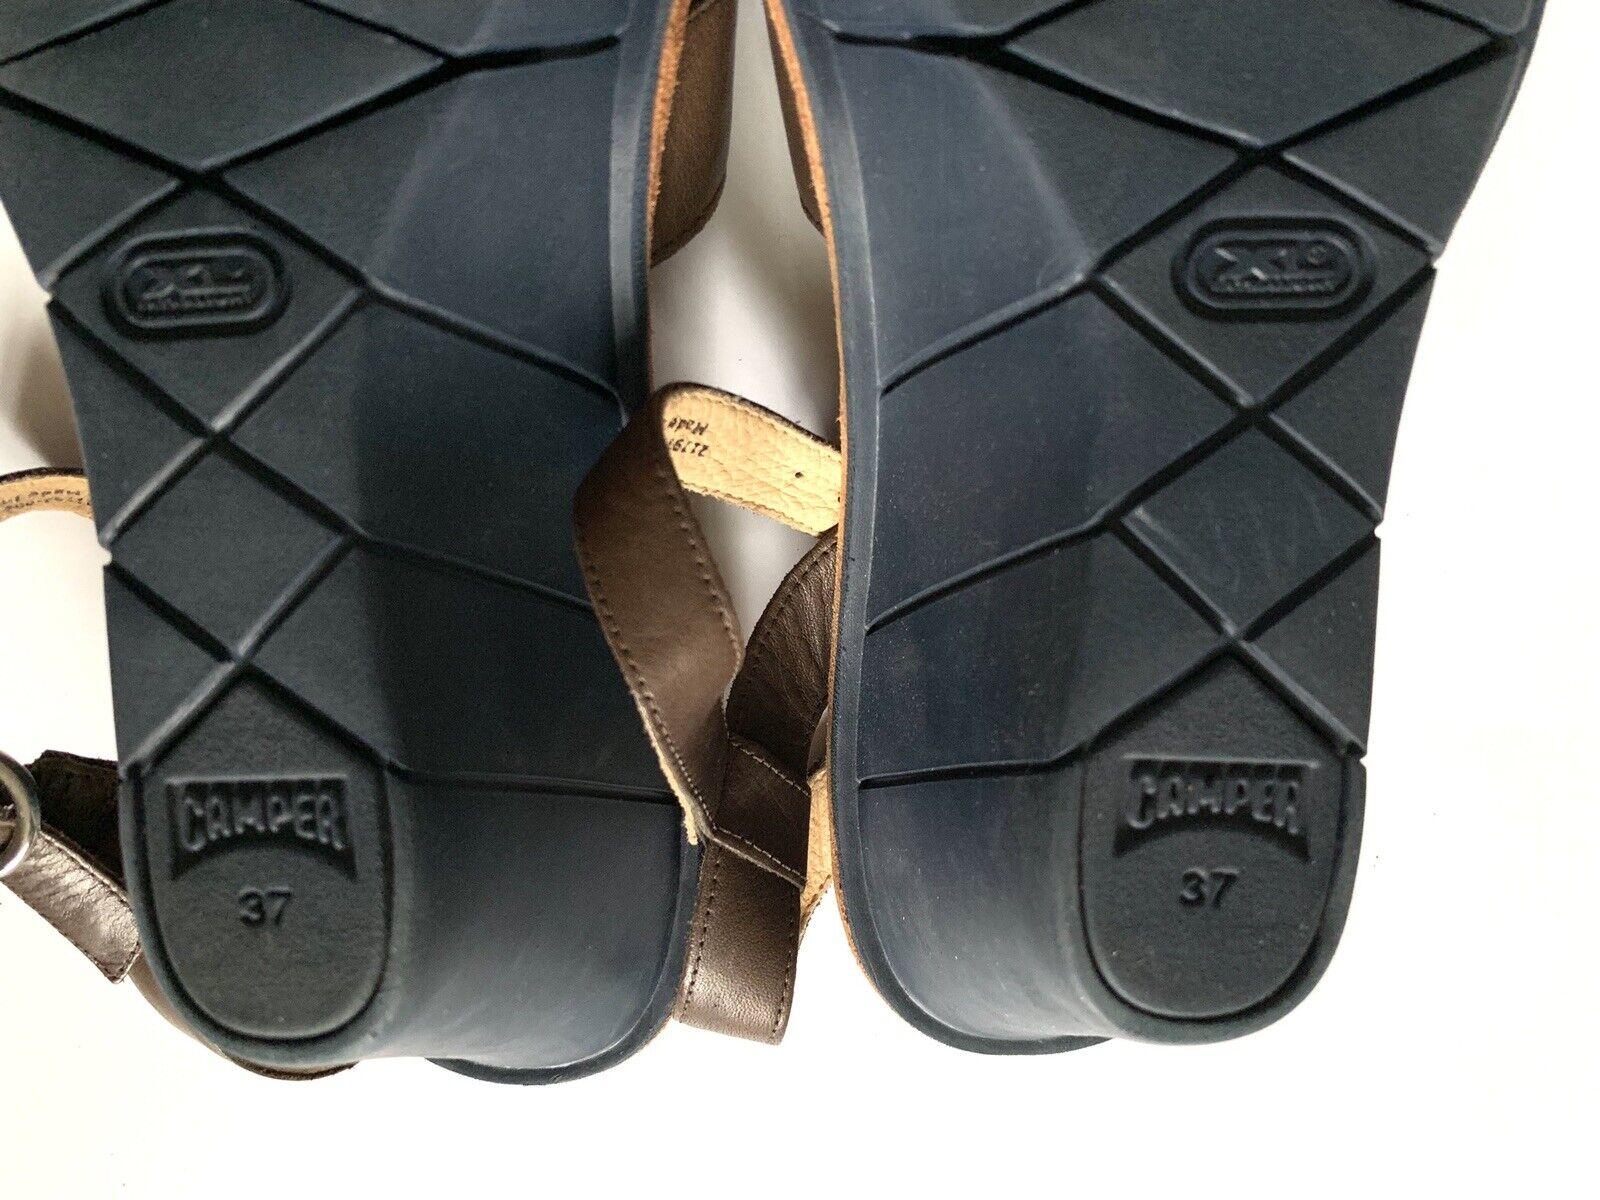 Camper donna Flippa Low Sandals Dimensione Dimensione Dimensione 7 Platform Wedge Wedges  170 14cfff